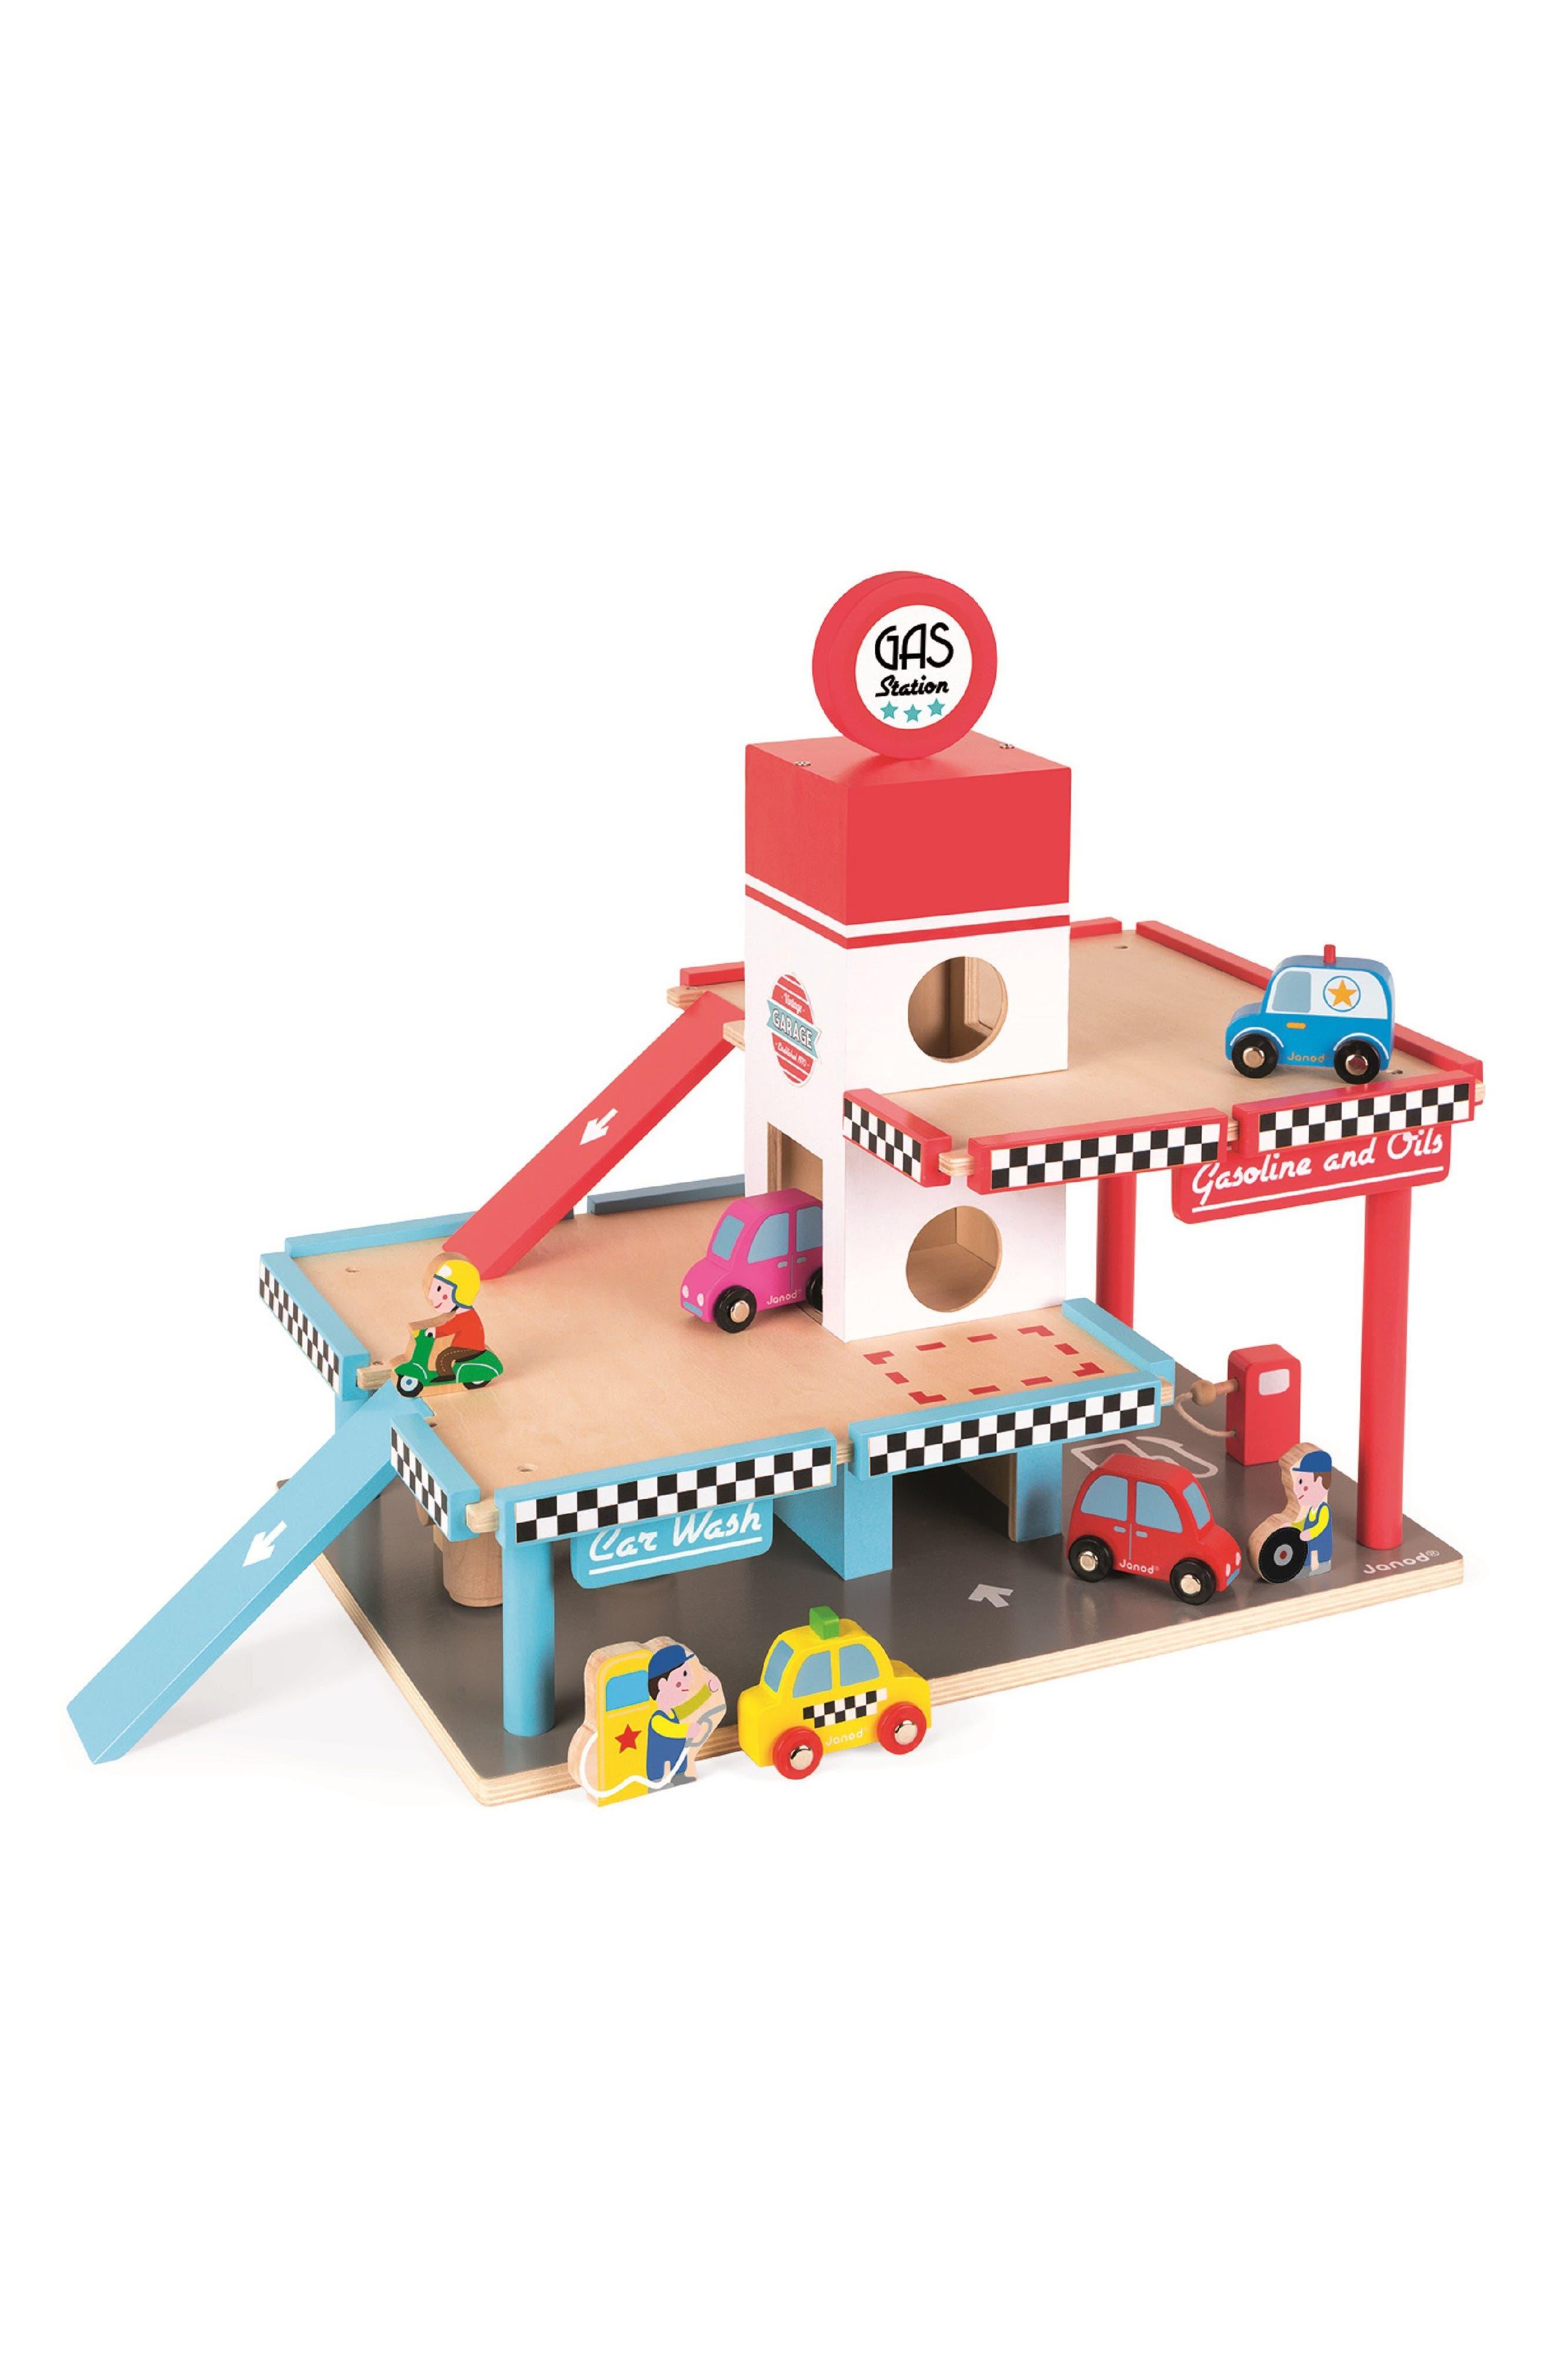 Main Image - Janod Gas Station Play Set